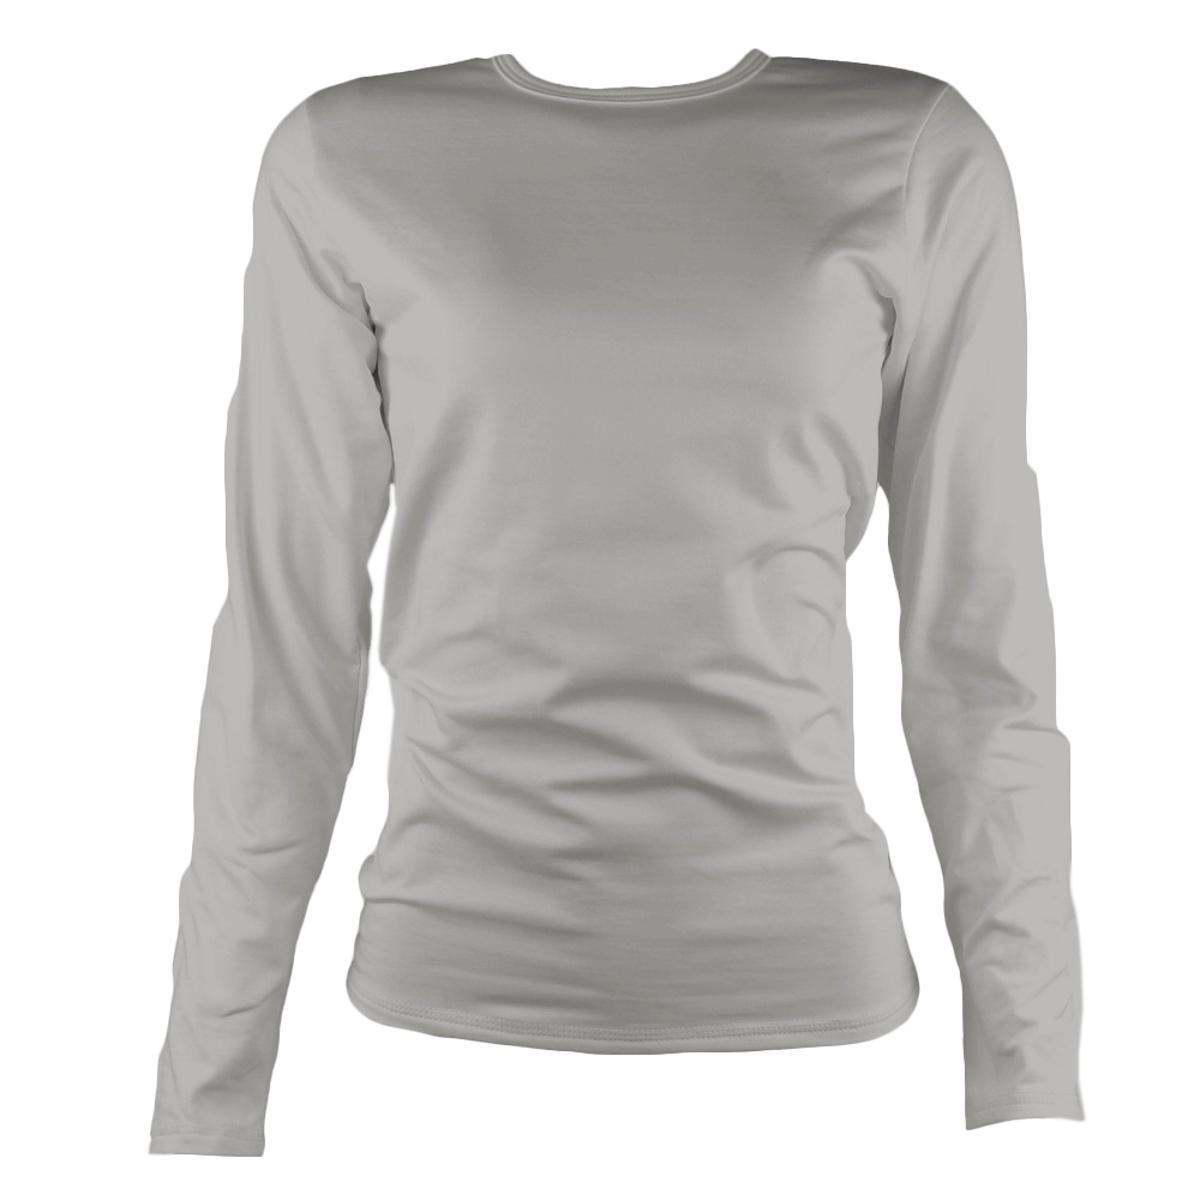 a00e114bb Camisa Térmica Feminina Segunda Pele Thermo Premium - Cinza